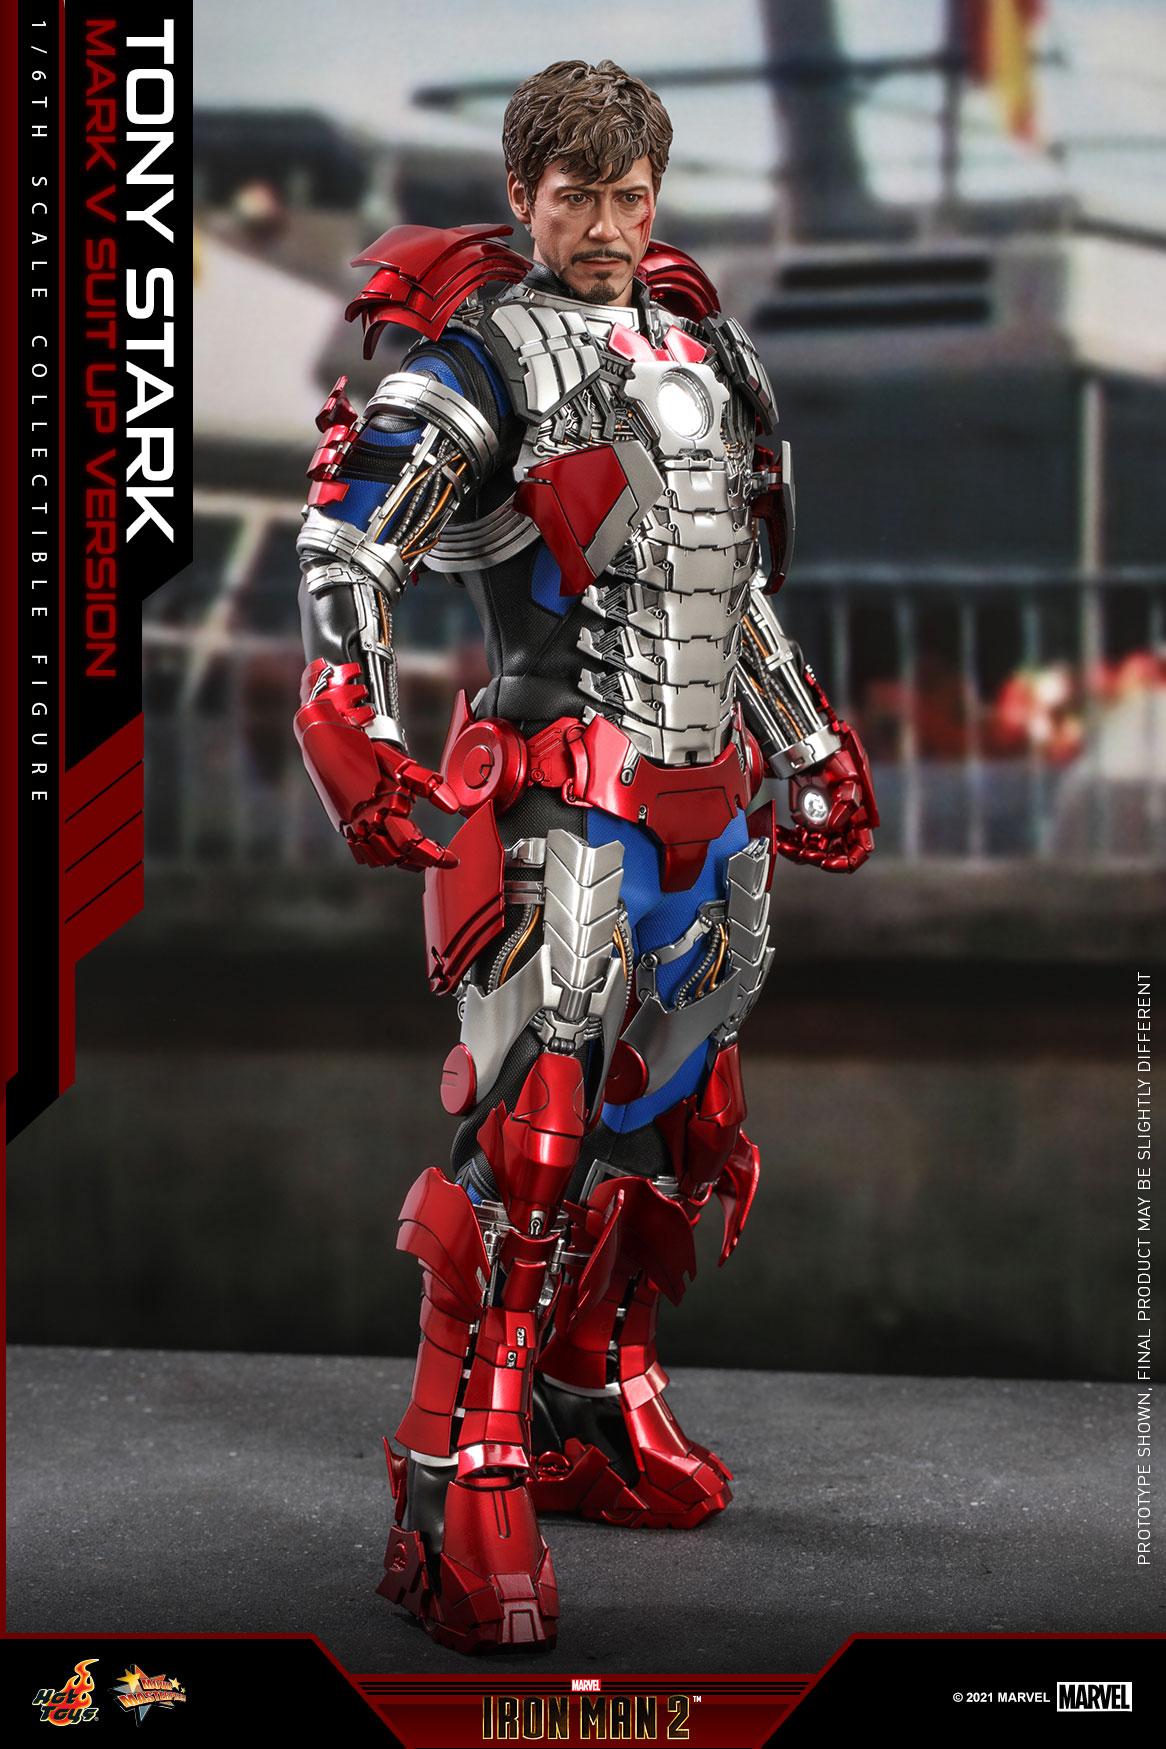 Hot Toys - IM2 - Tony Stark (Mark V Suit Up Version) collectible figure_PR3